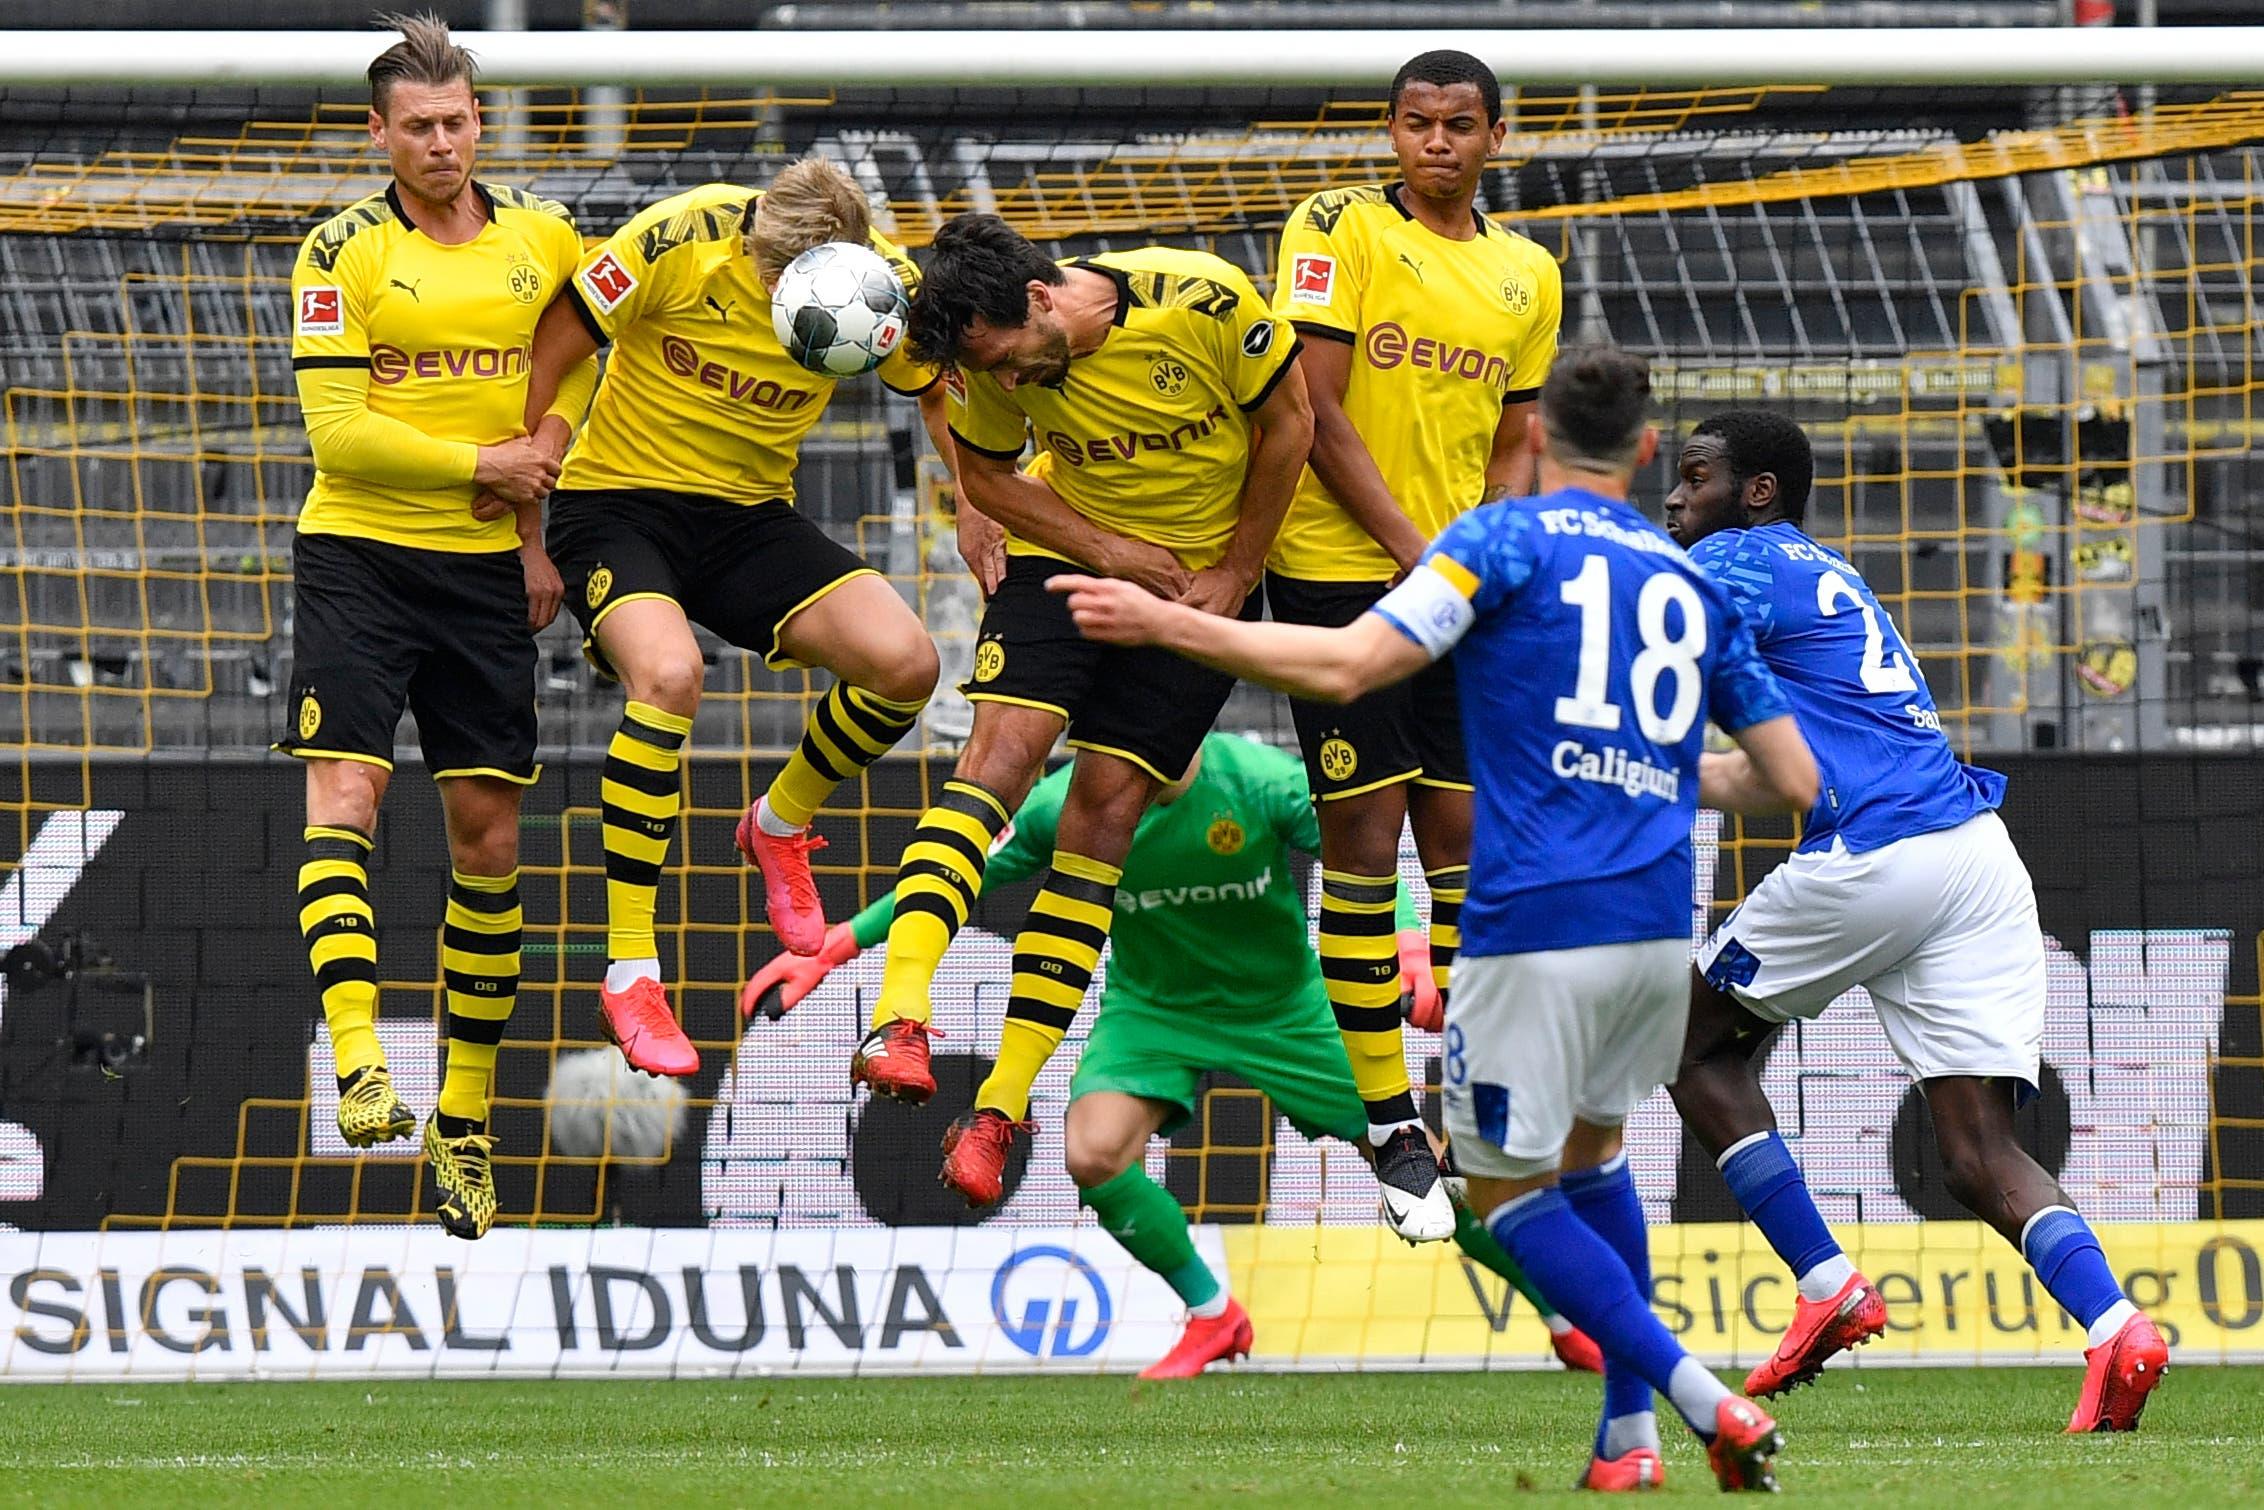 Schalke's Daniel Caligiuri, foreground, has his free kick blocked during the German Bundesliga football match between Borussia Dortmund and Schalke 04 in Dortmund, Germany, on Saturday, May 16, 2020. (AP)